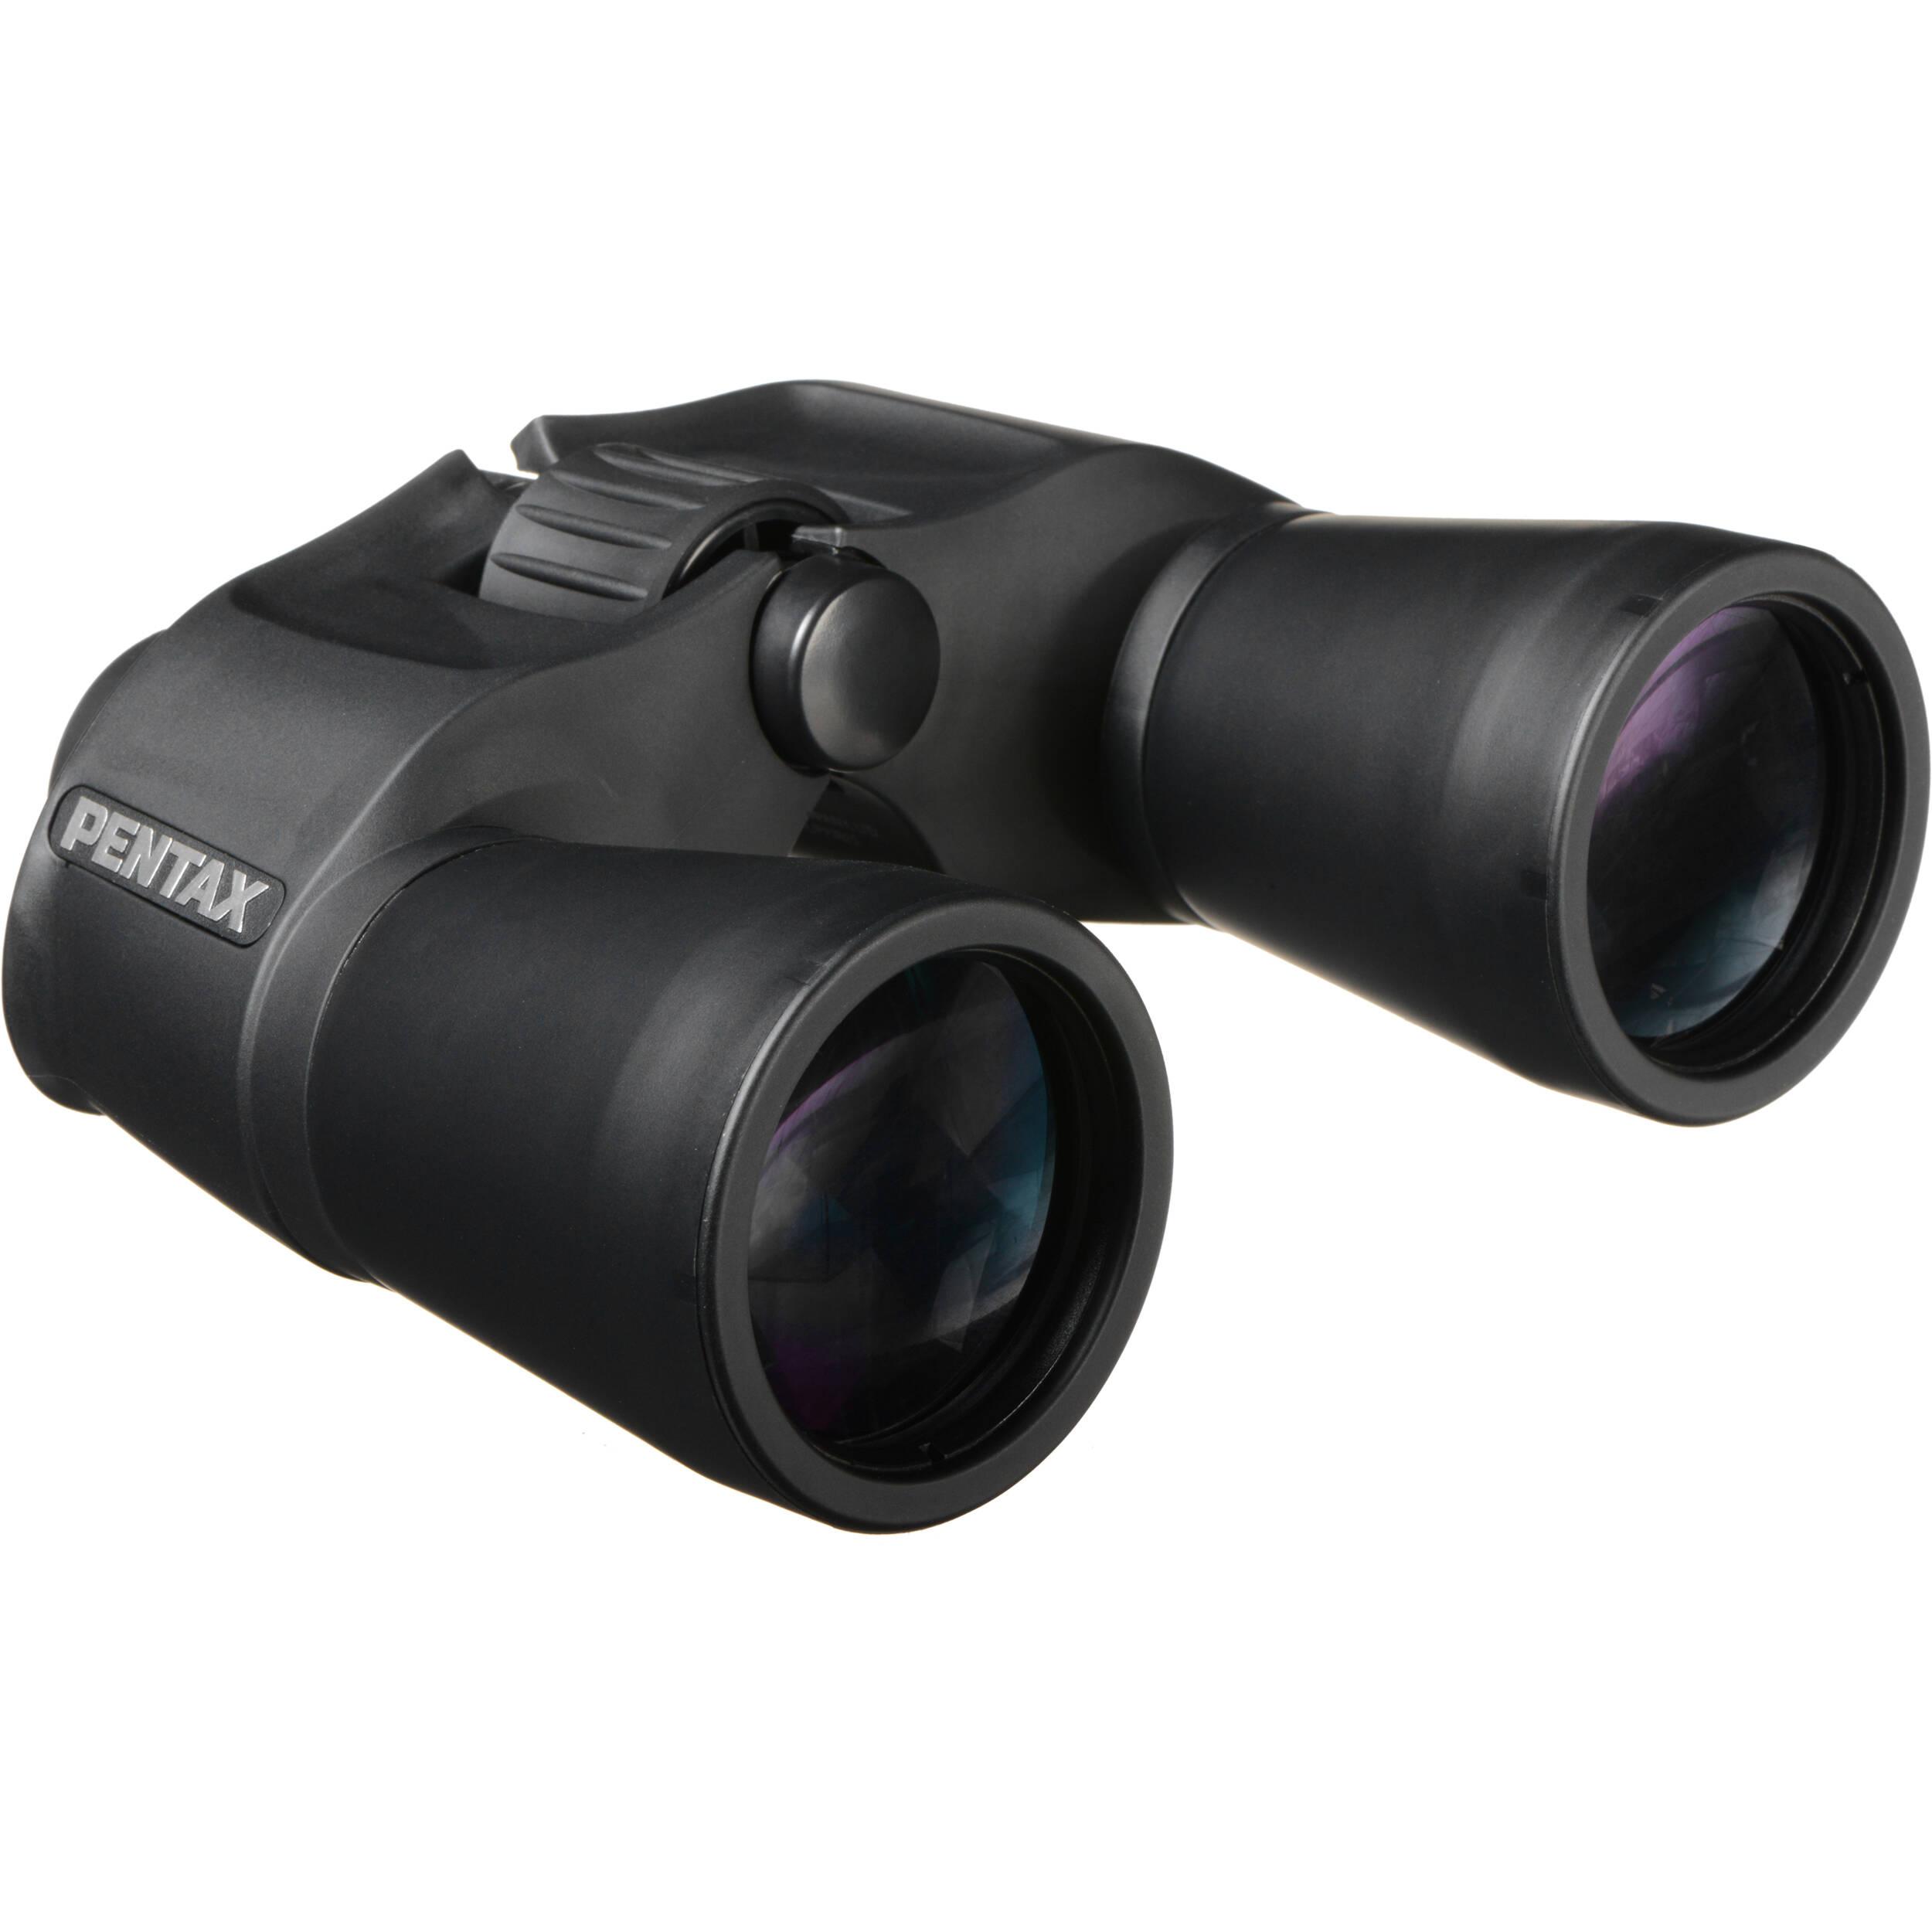 pentax 12x50 s series sp binocular 65904 b h photo video rh bhphotovideo com Pentax Eyepiece Magnification Chart Pentax UCF II